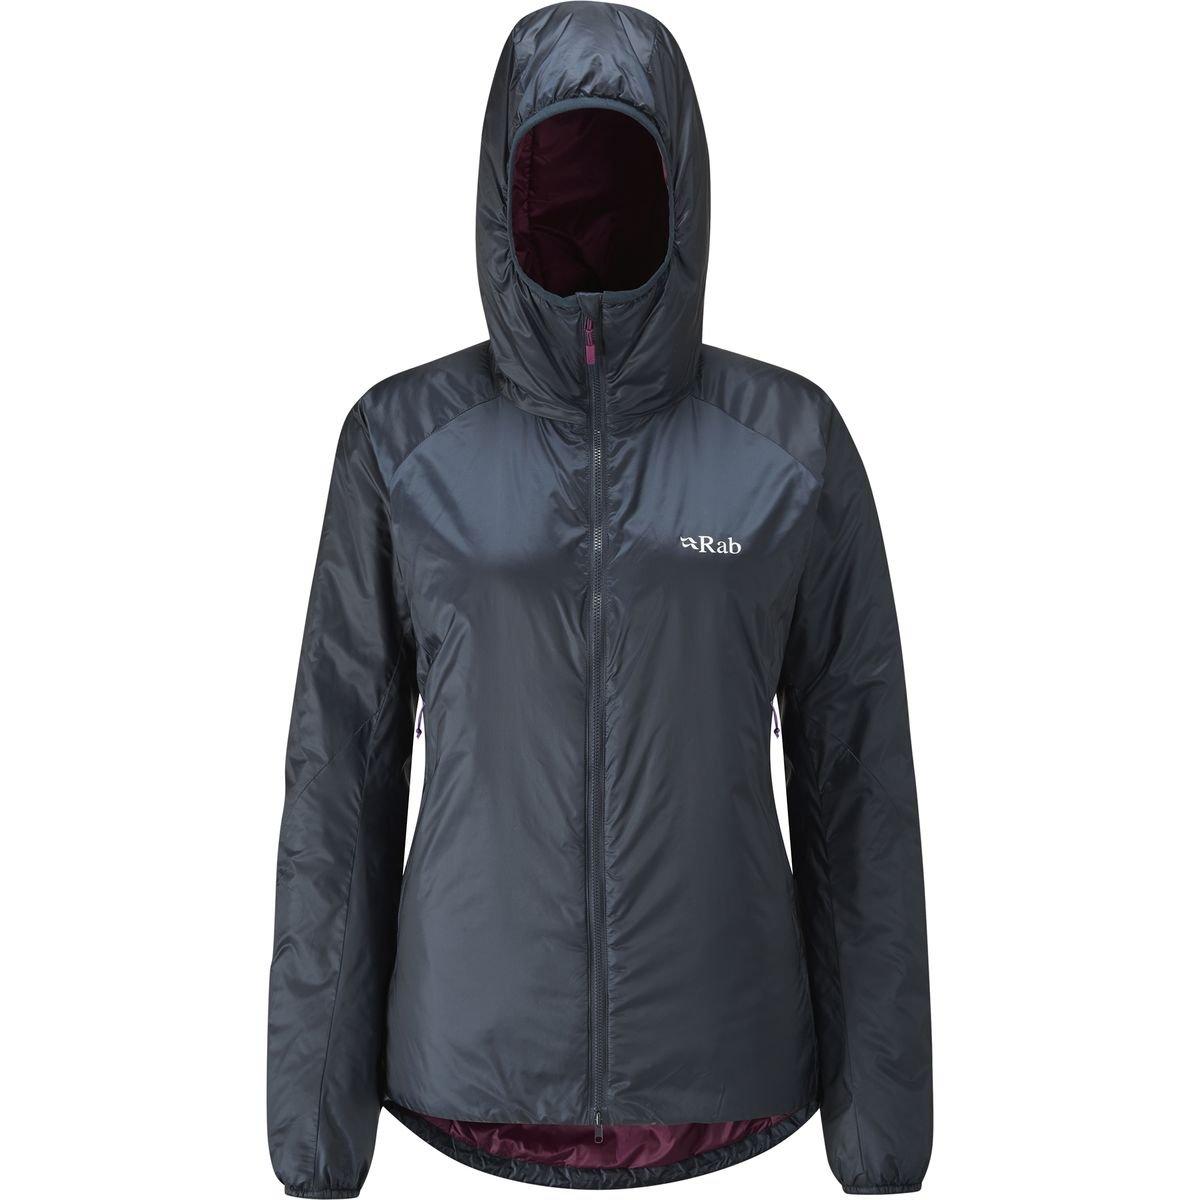 Rab xenon-x Jacket – Women 's B01GKDNR9G 10|Ebony/Berry Ebony/Berry 10